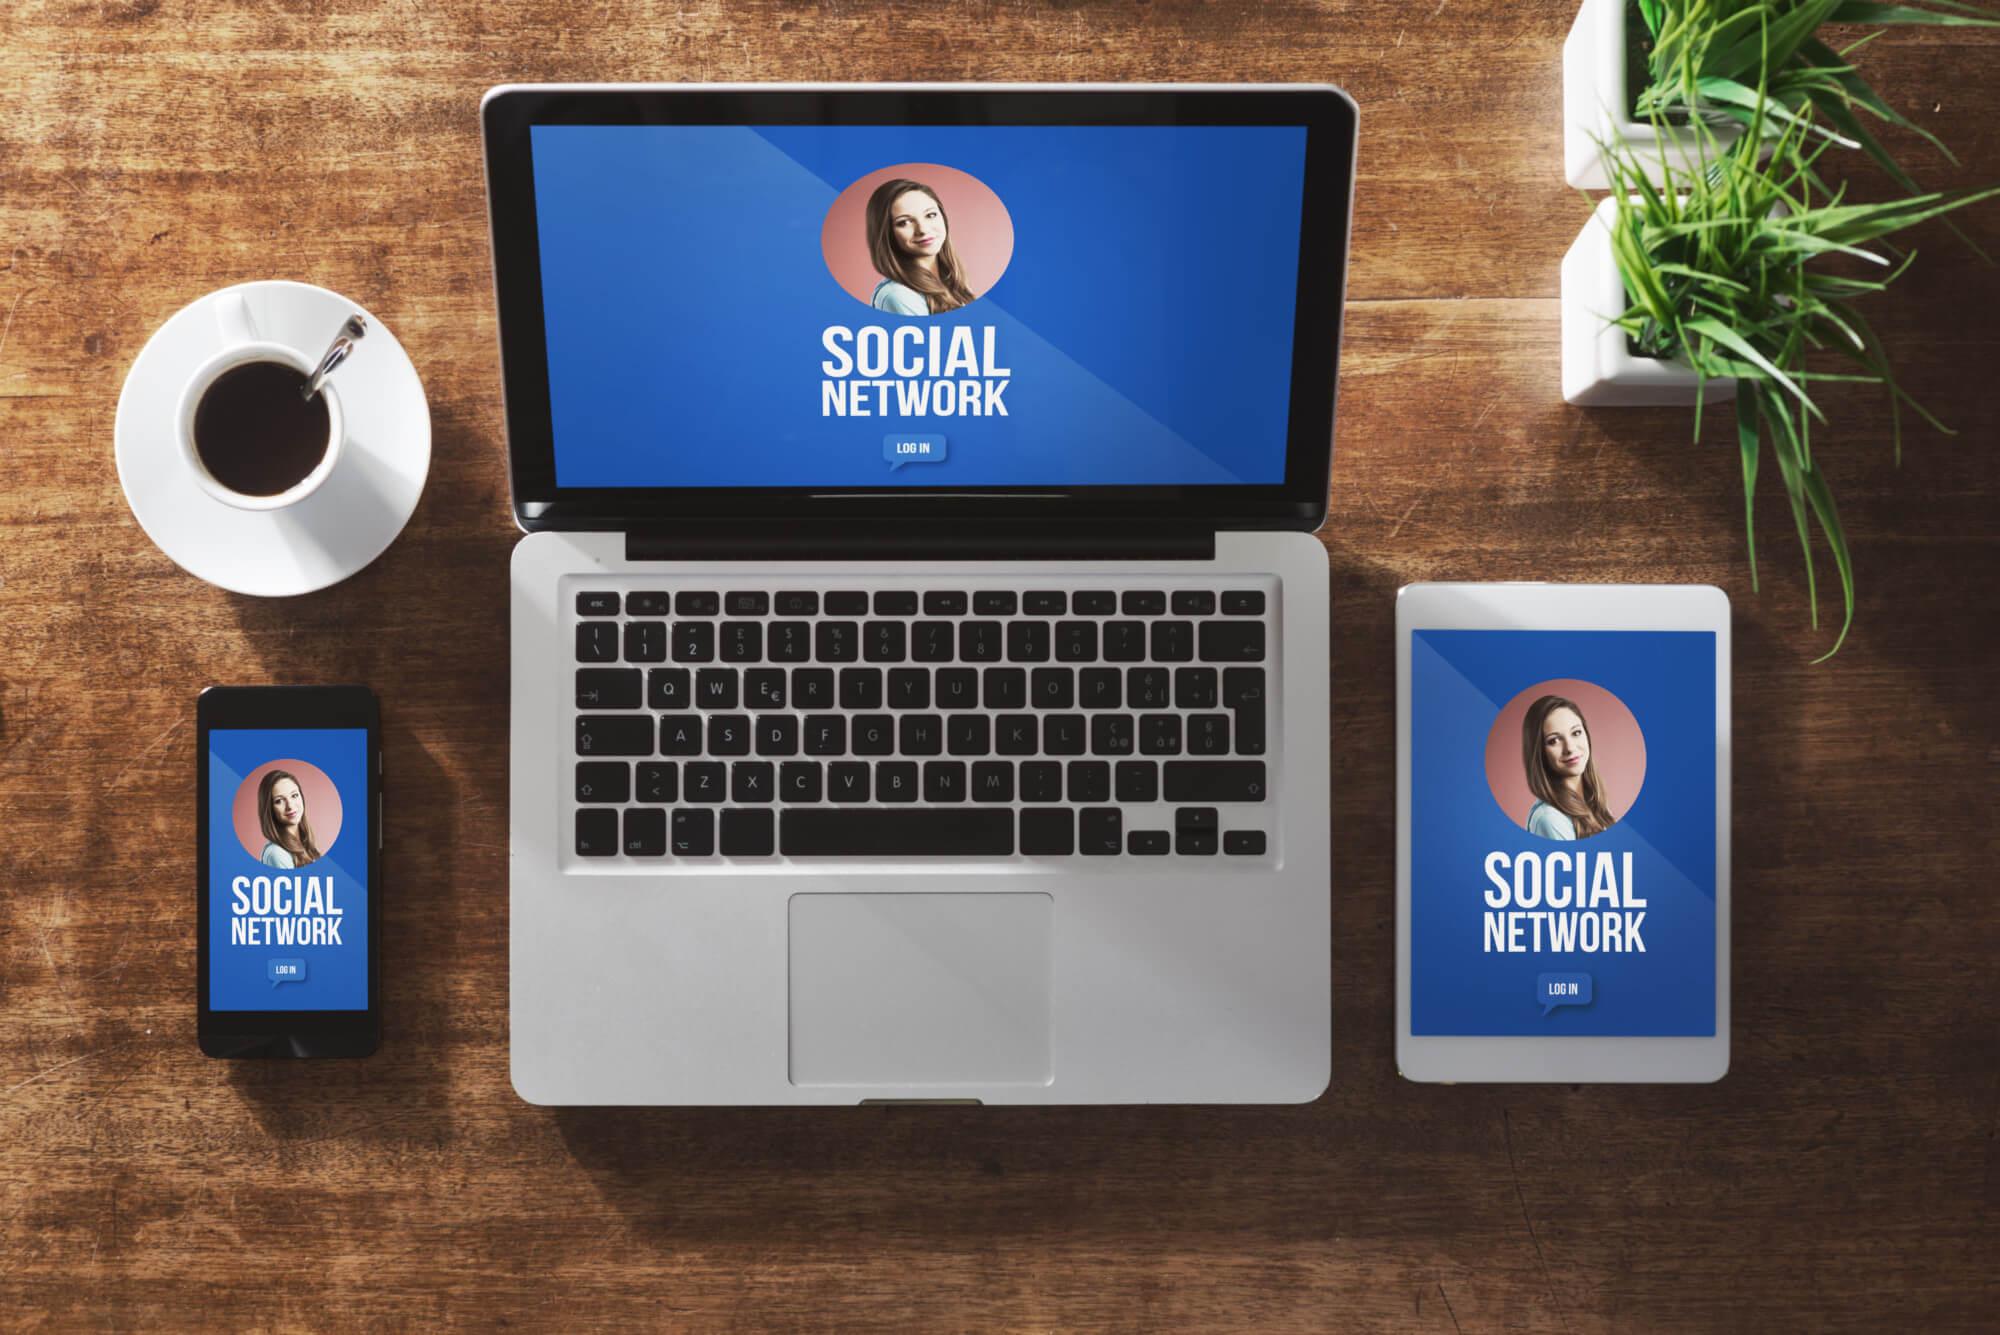 mortgage brokers using social media